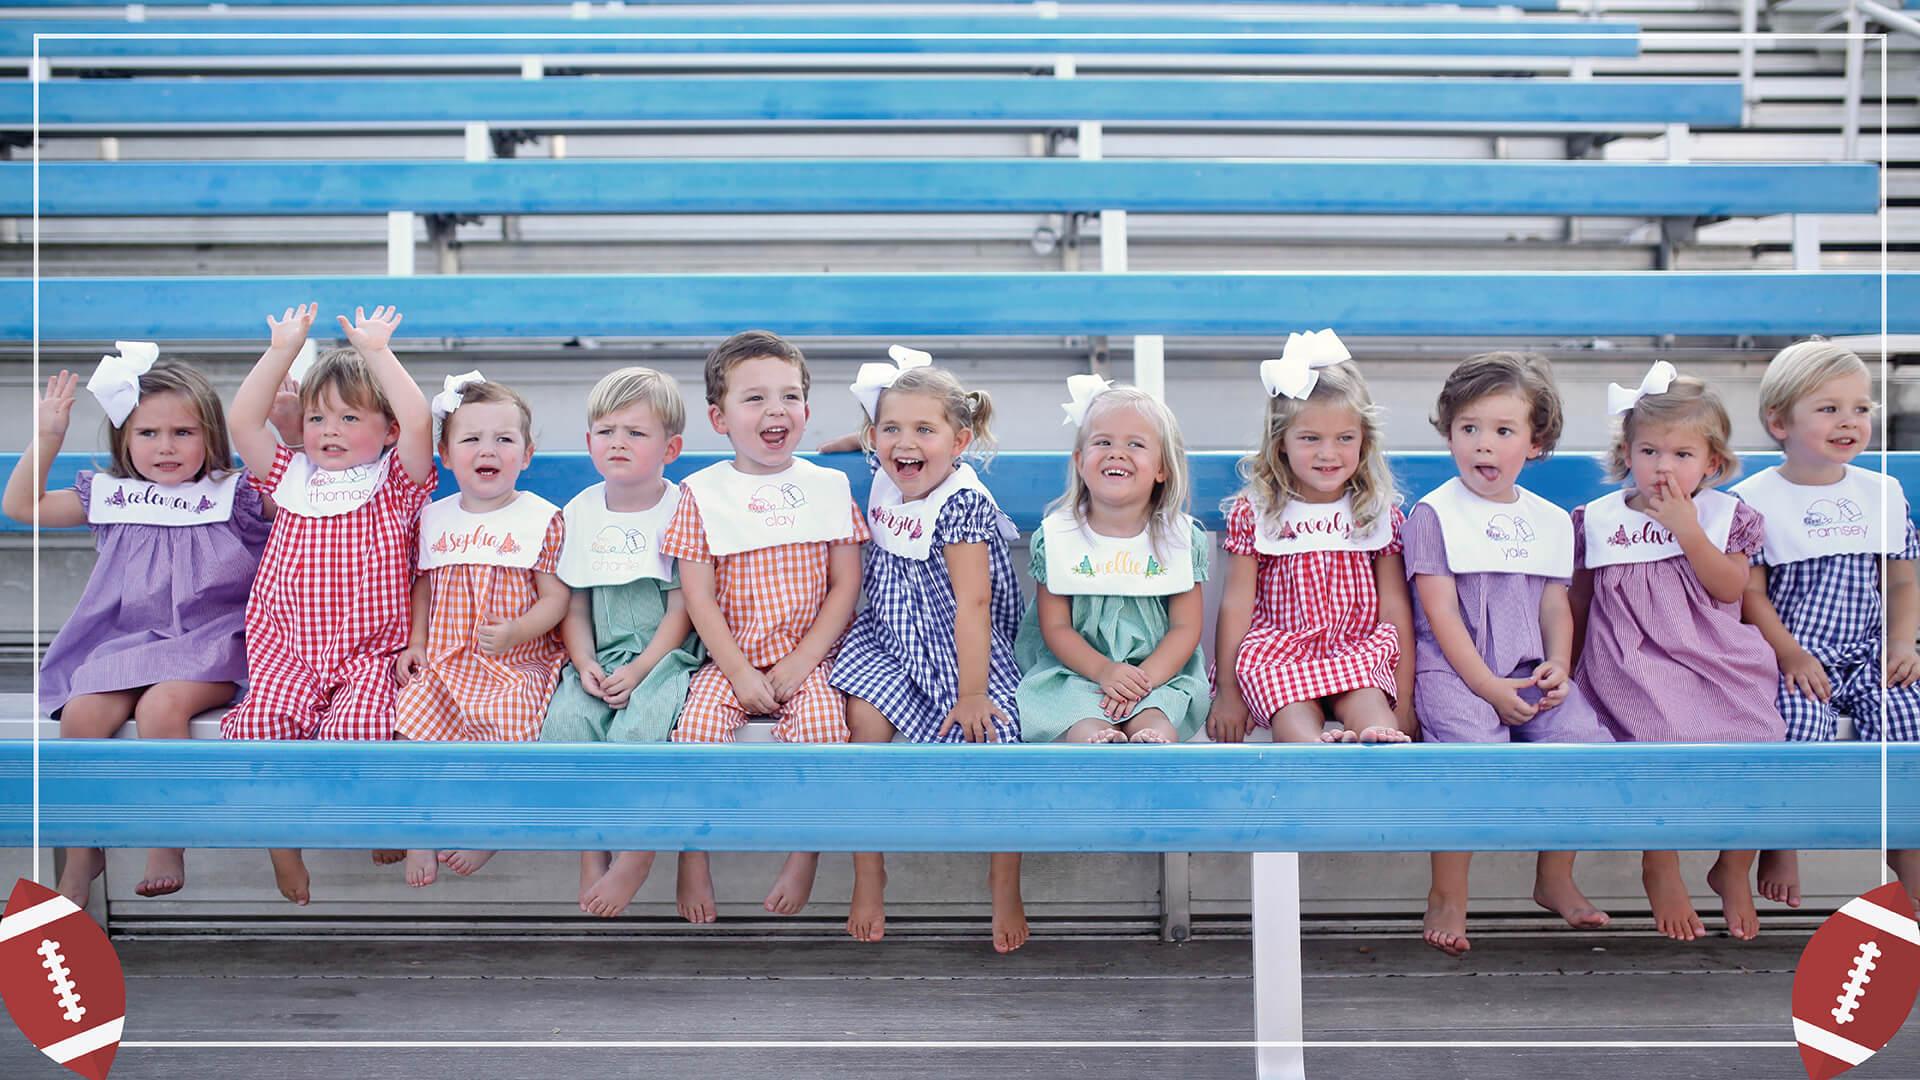 Children's College Clothing